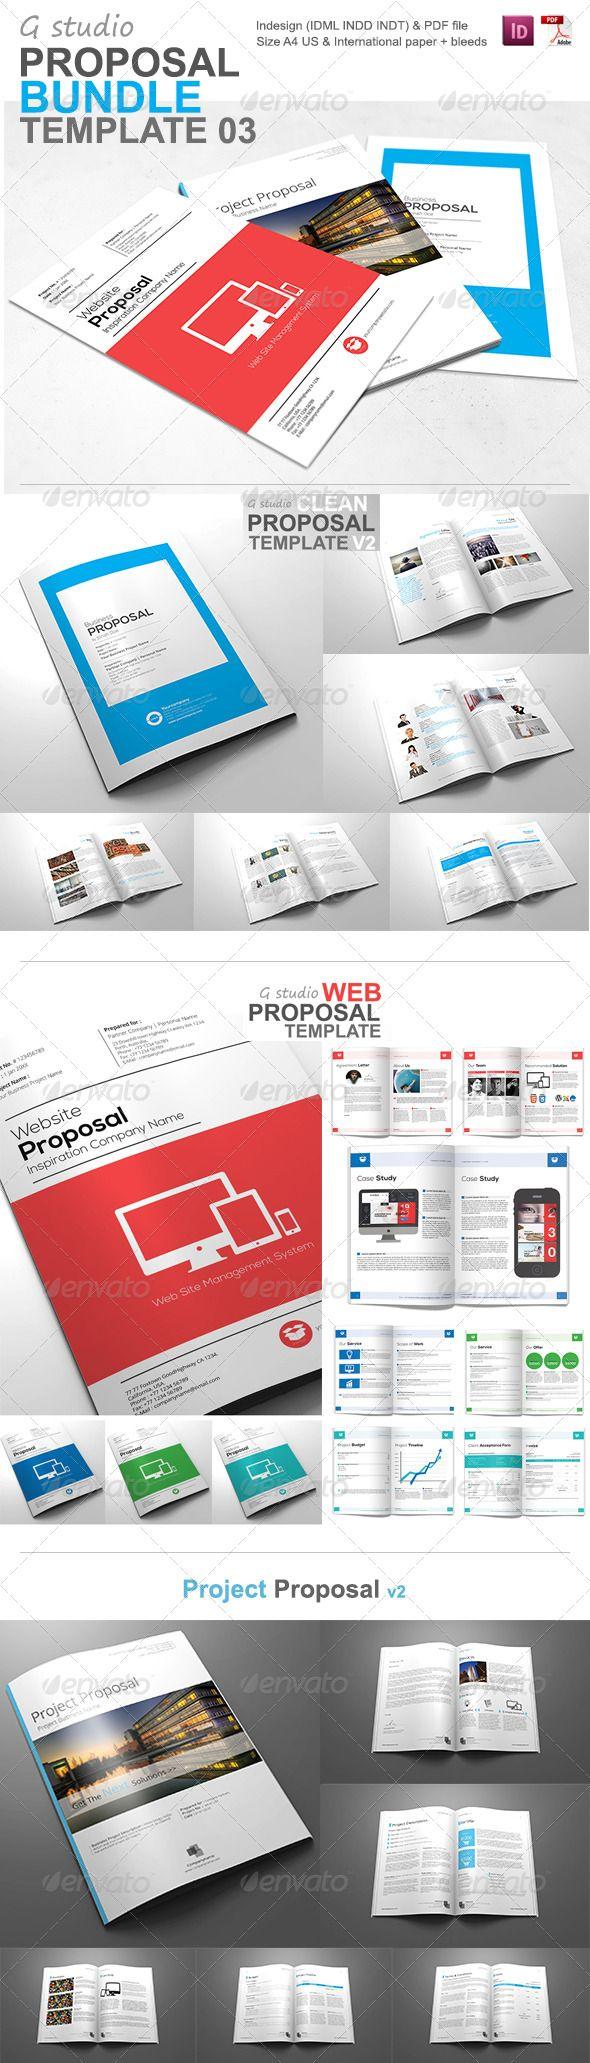 Gstudio Proposal Bundle 03 87 best Print